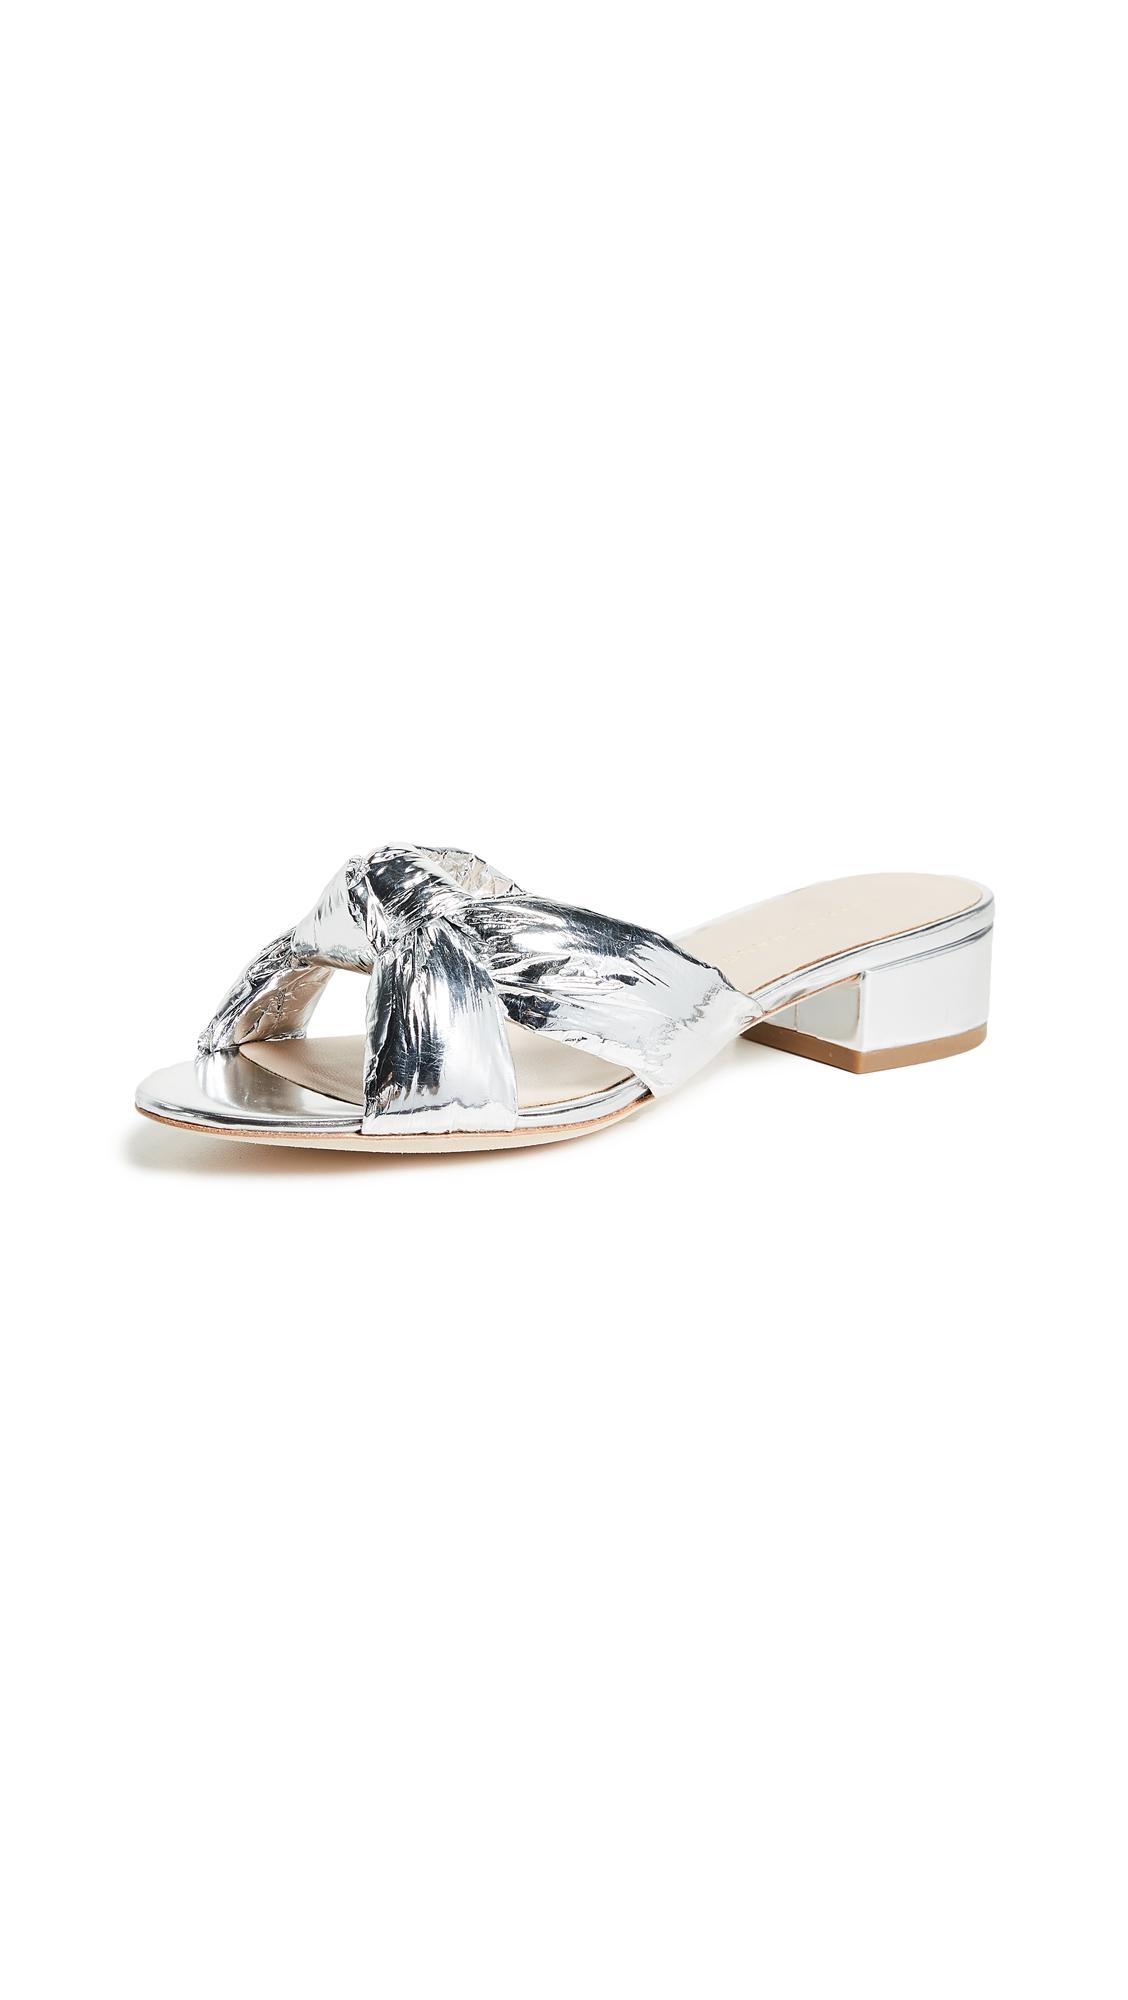 Loeffler Randall Elsie Sandals - Silver